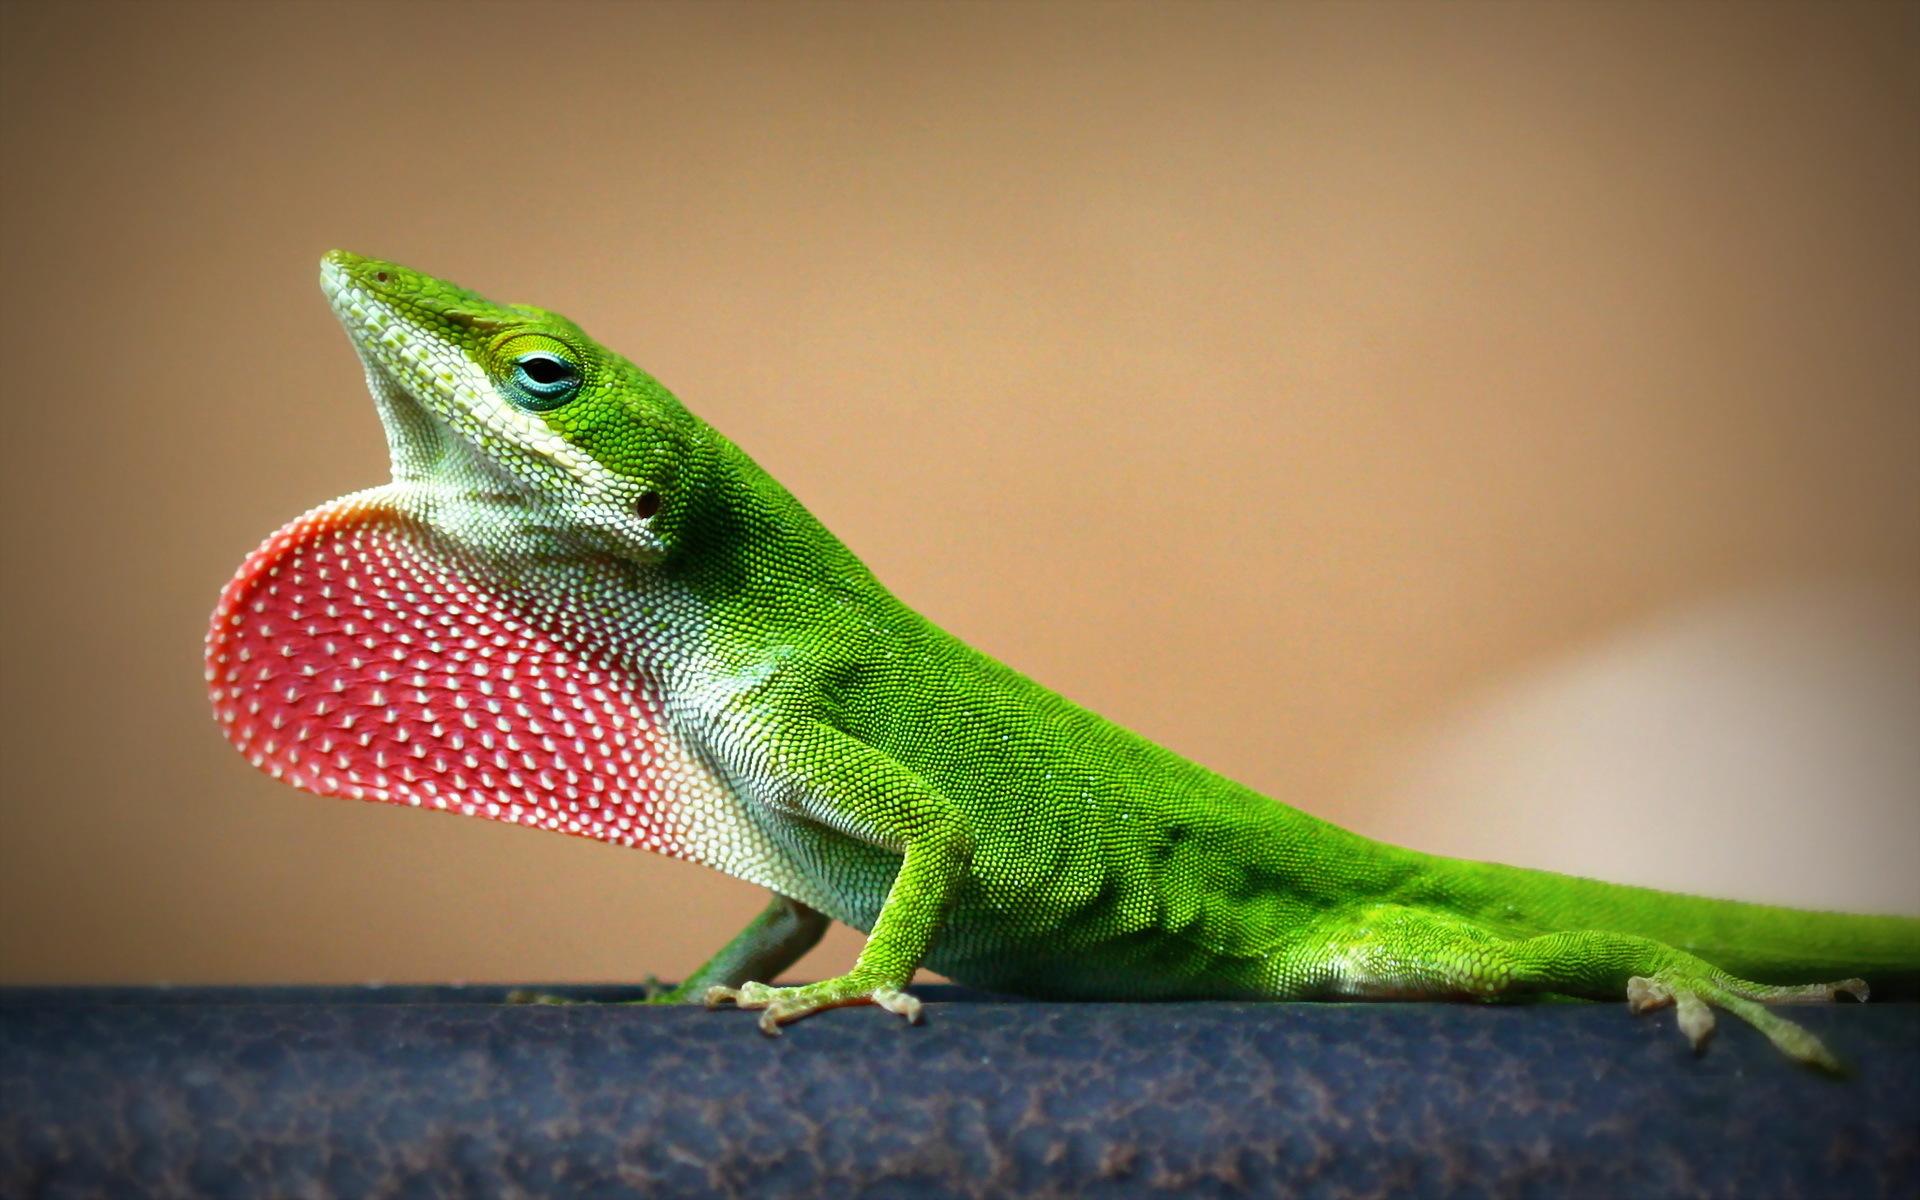 Lizard Computer Wallpapers, Desktop Backgrounds ...